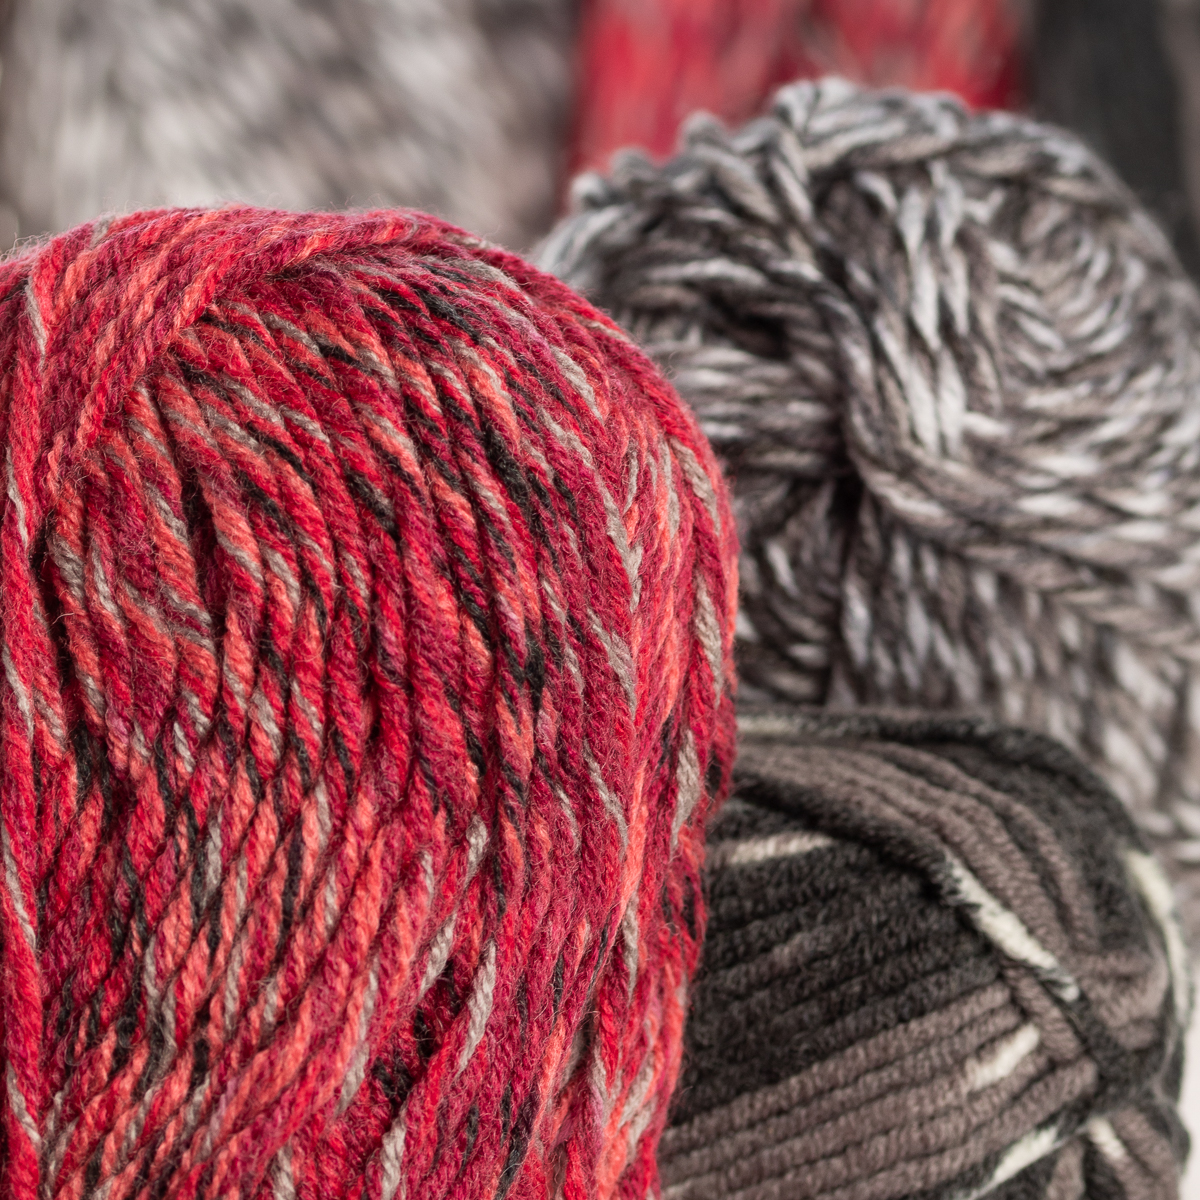 3pk-Lion-Brand-Woolspun-Acrylic-amp-Wool-Yarn-Bulky-5-Knit-Crocheting-Skeins-Soft thumbnail 66